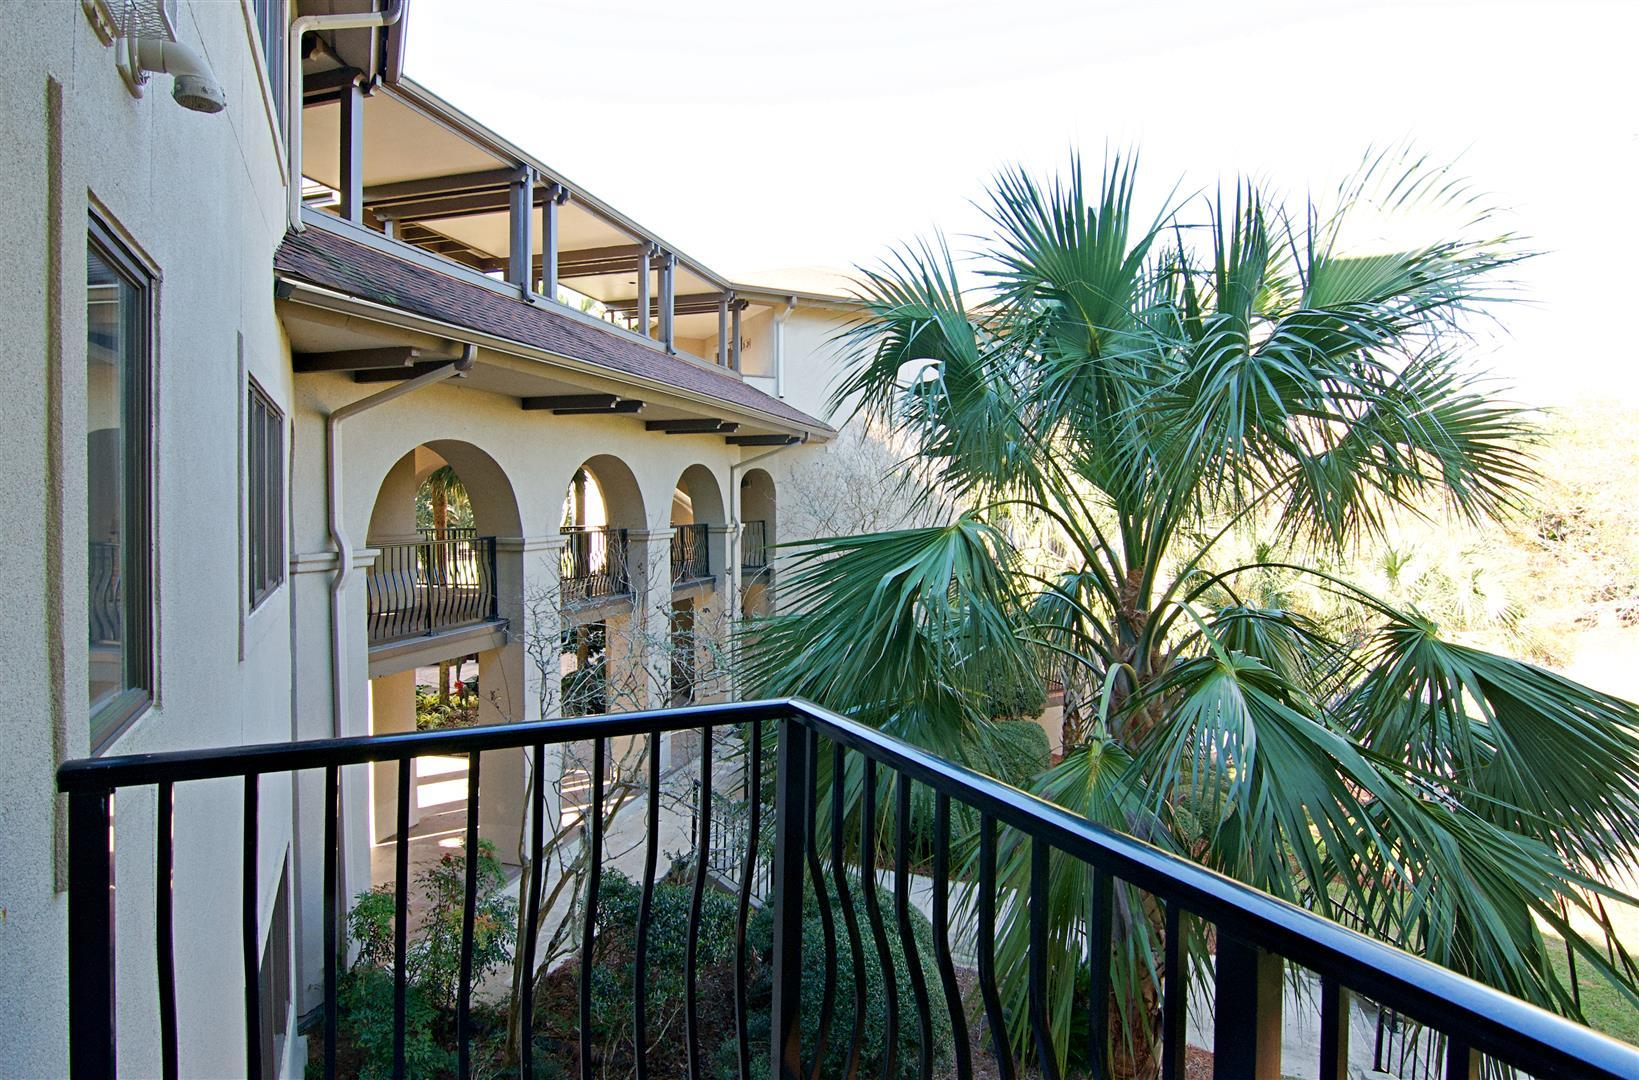 Seabrook Island Homes For Sale - 3020 Ocean Winds, Seabrook Island, SC - 13